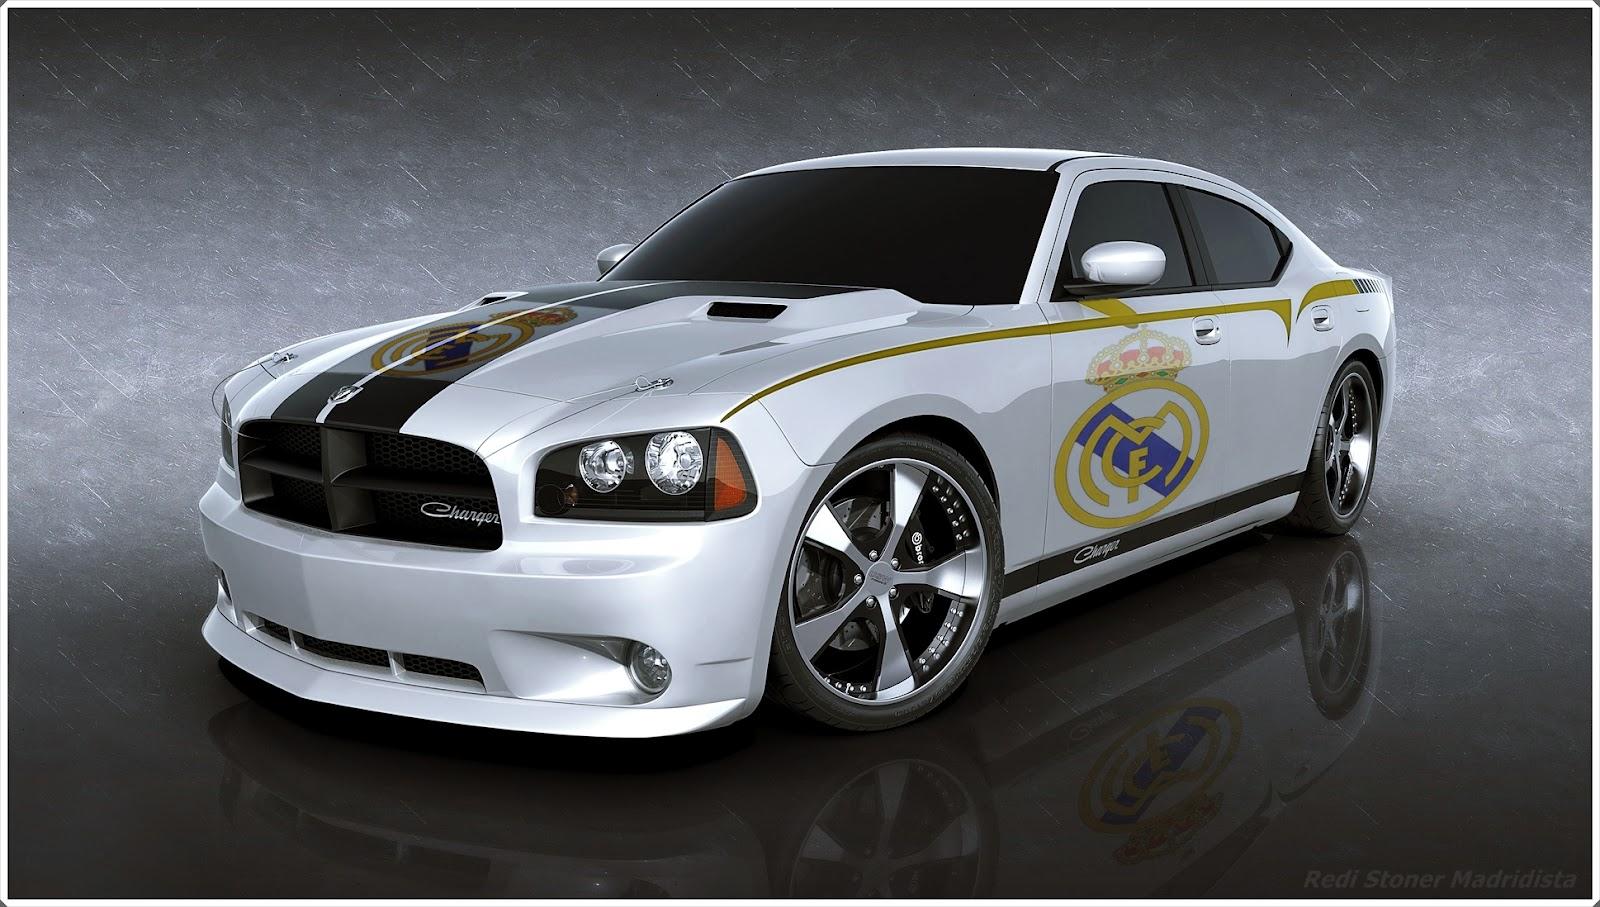 http://2.bp.blogspot.com/-MtA0BcpRnYM/T4rpKOdQjxI/AAAAAAAAAWc/04pECLiJ2rc/s1600/Car-Wallpapers-2012-2013-16.jpg